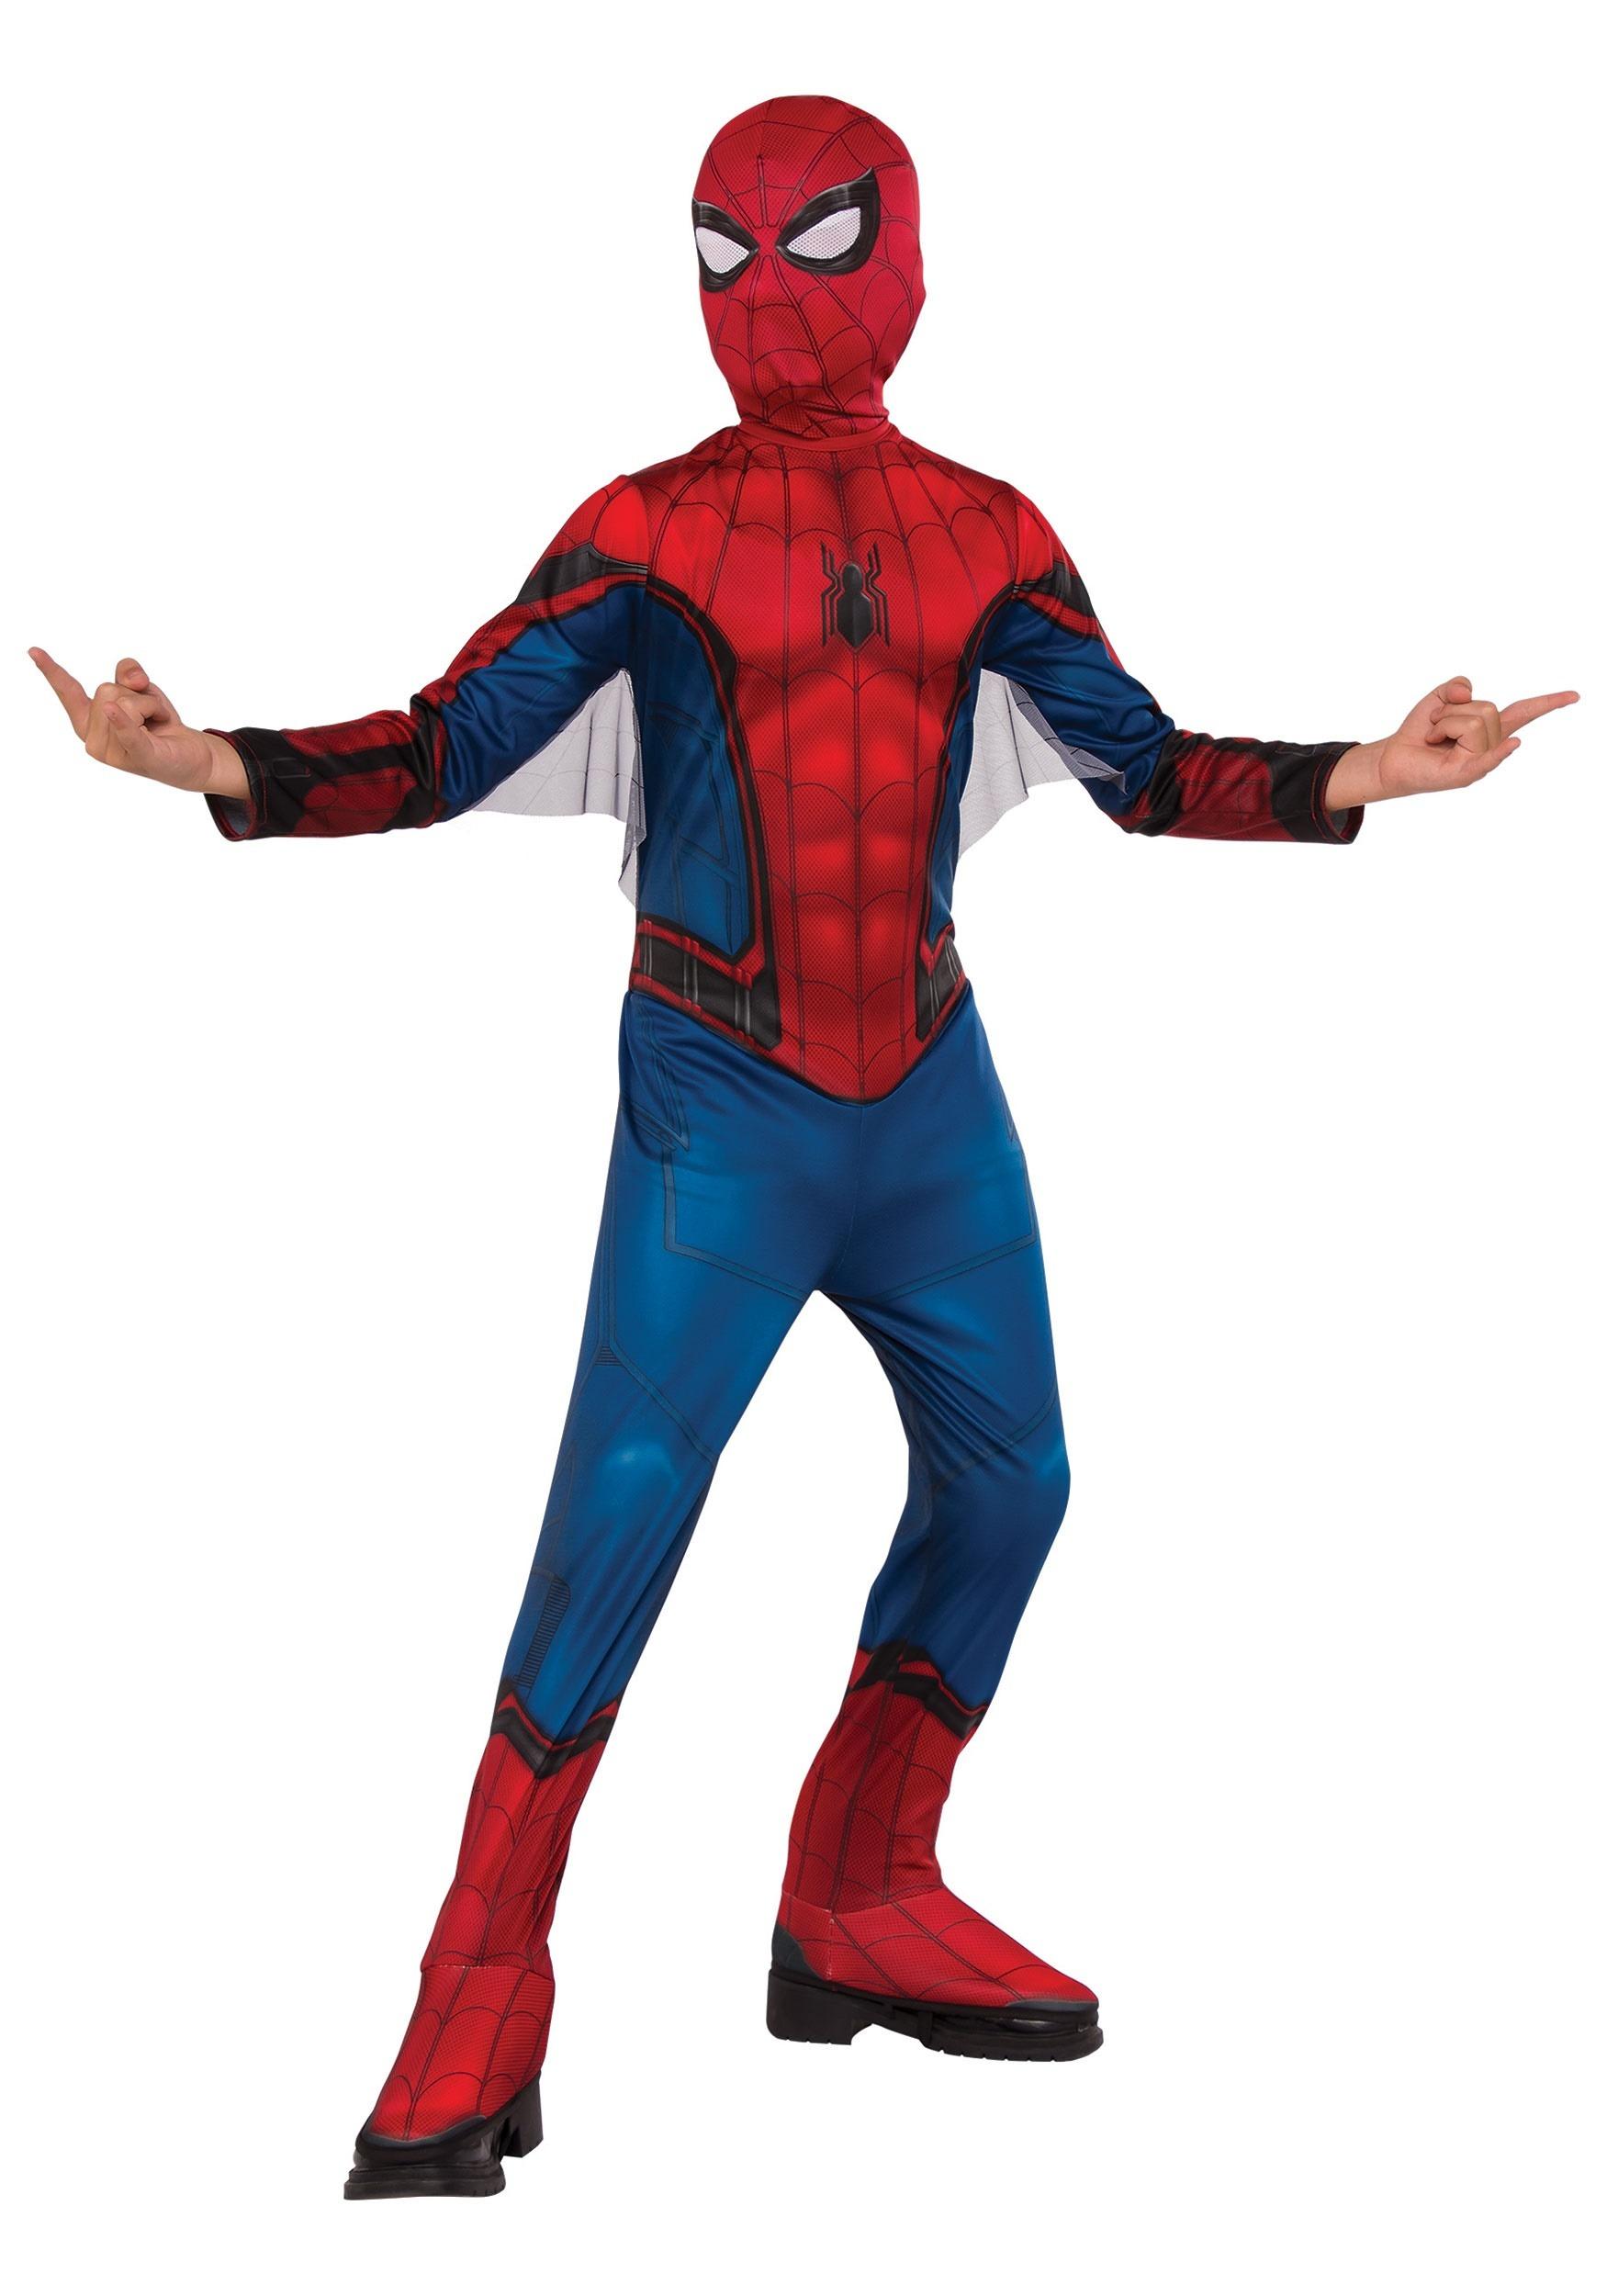 Boy's Spiderman Costume RU630730